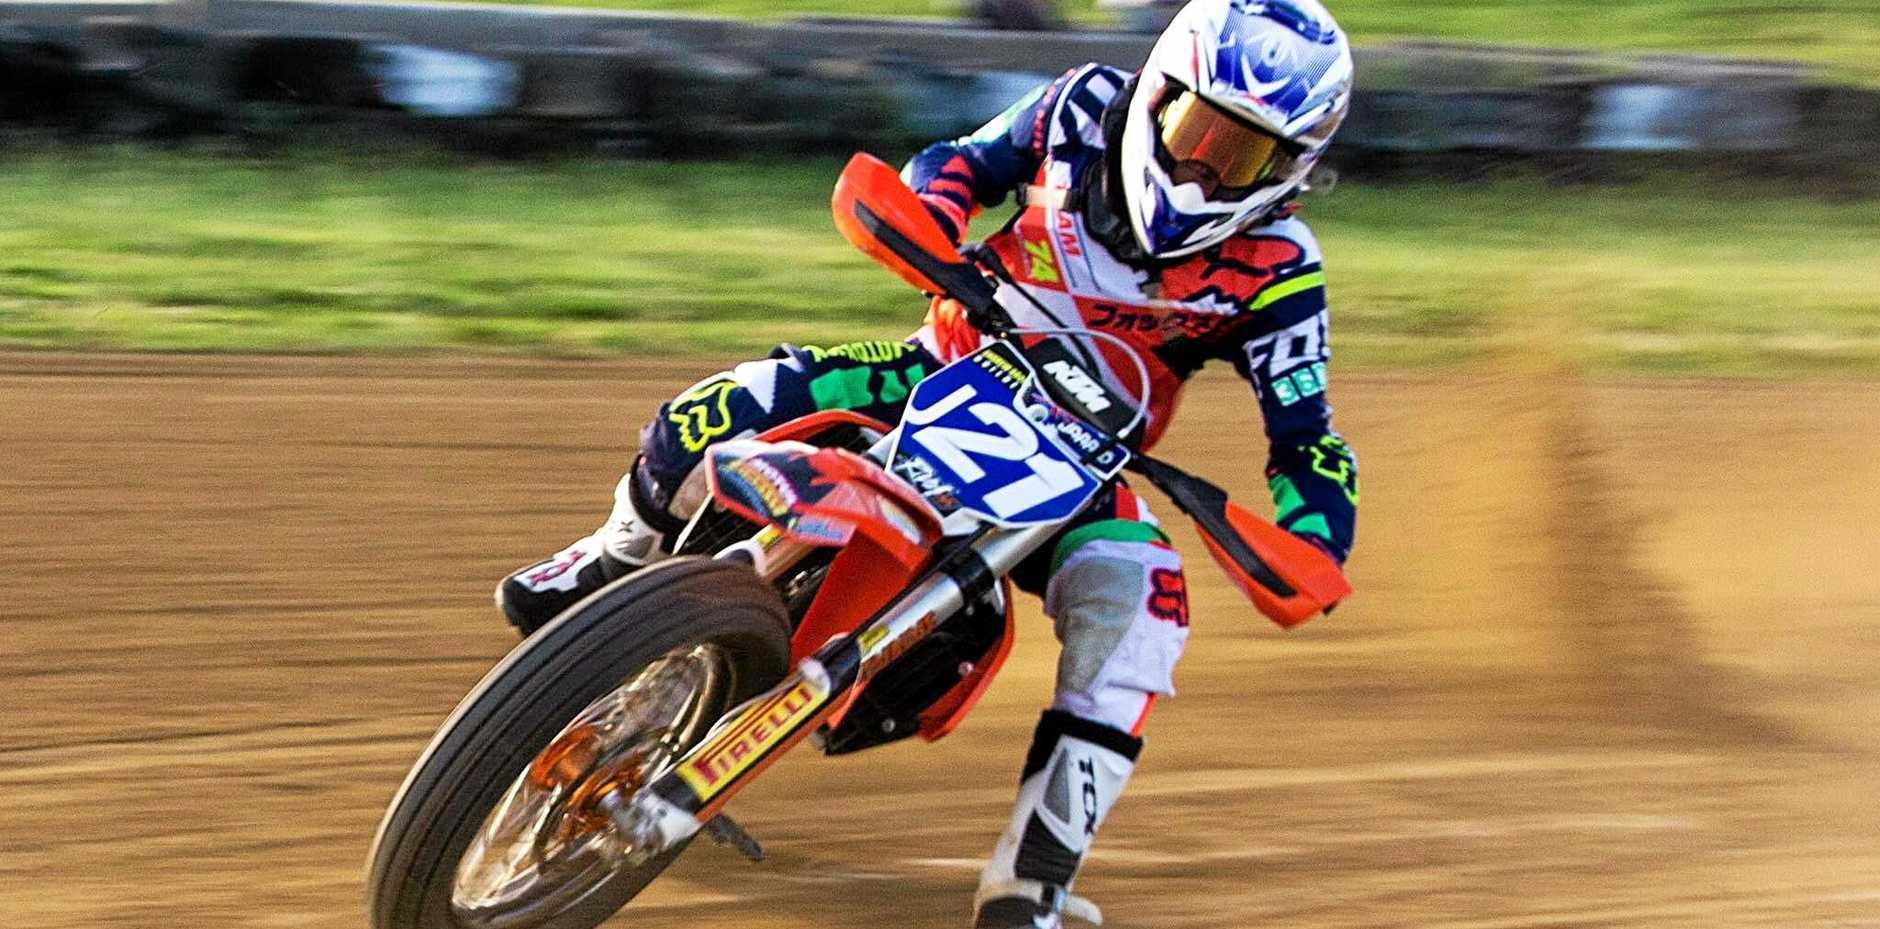 Teenaged Gympie dirt bike sensation Jarred Brook has become the first international rider to win the prestigious American Motorcyclist Association Horizon Award.